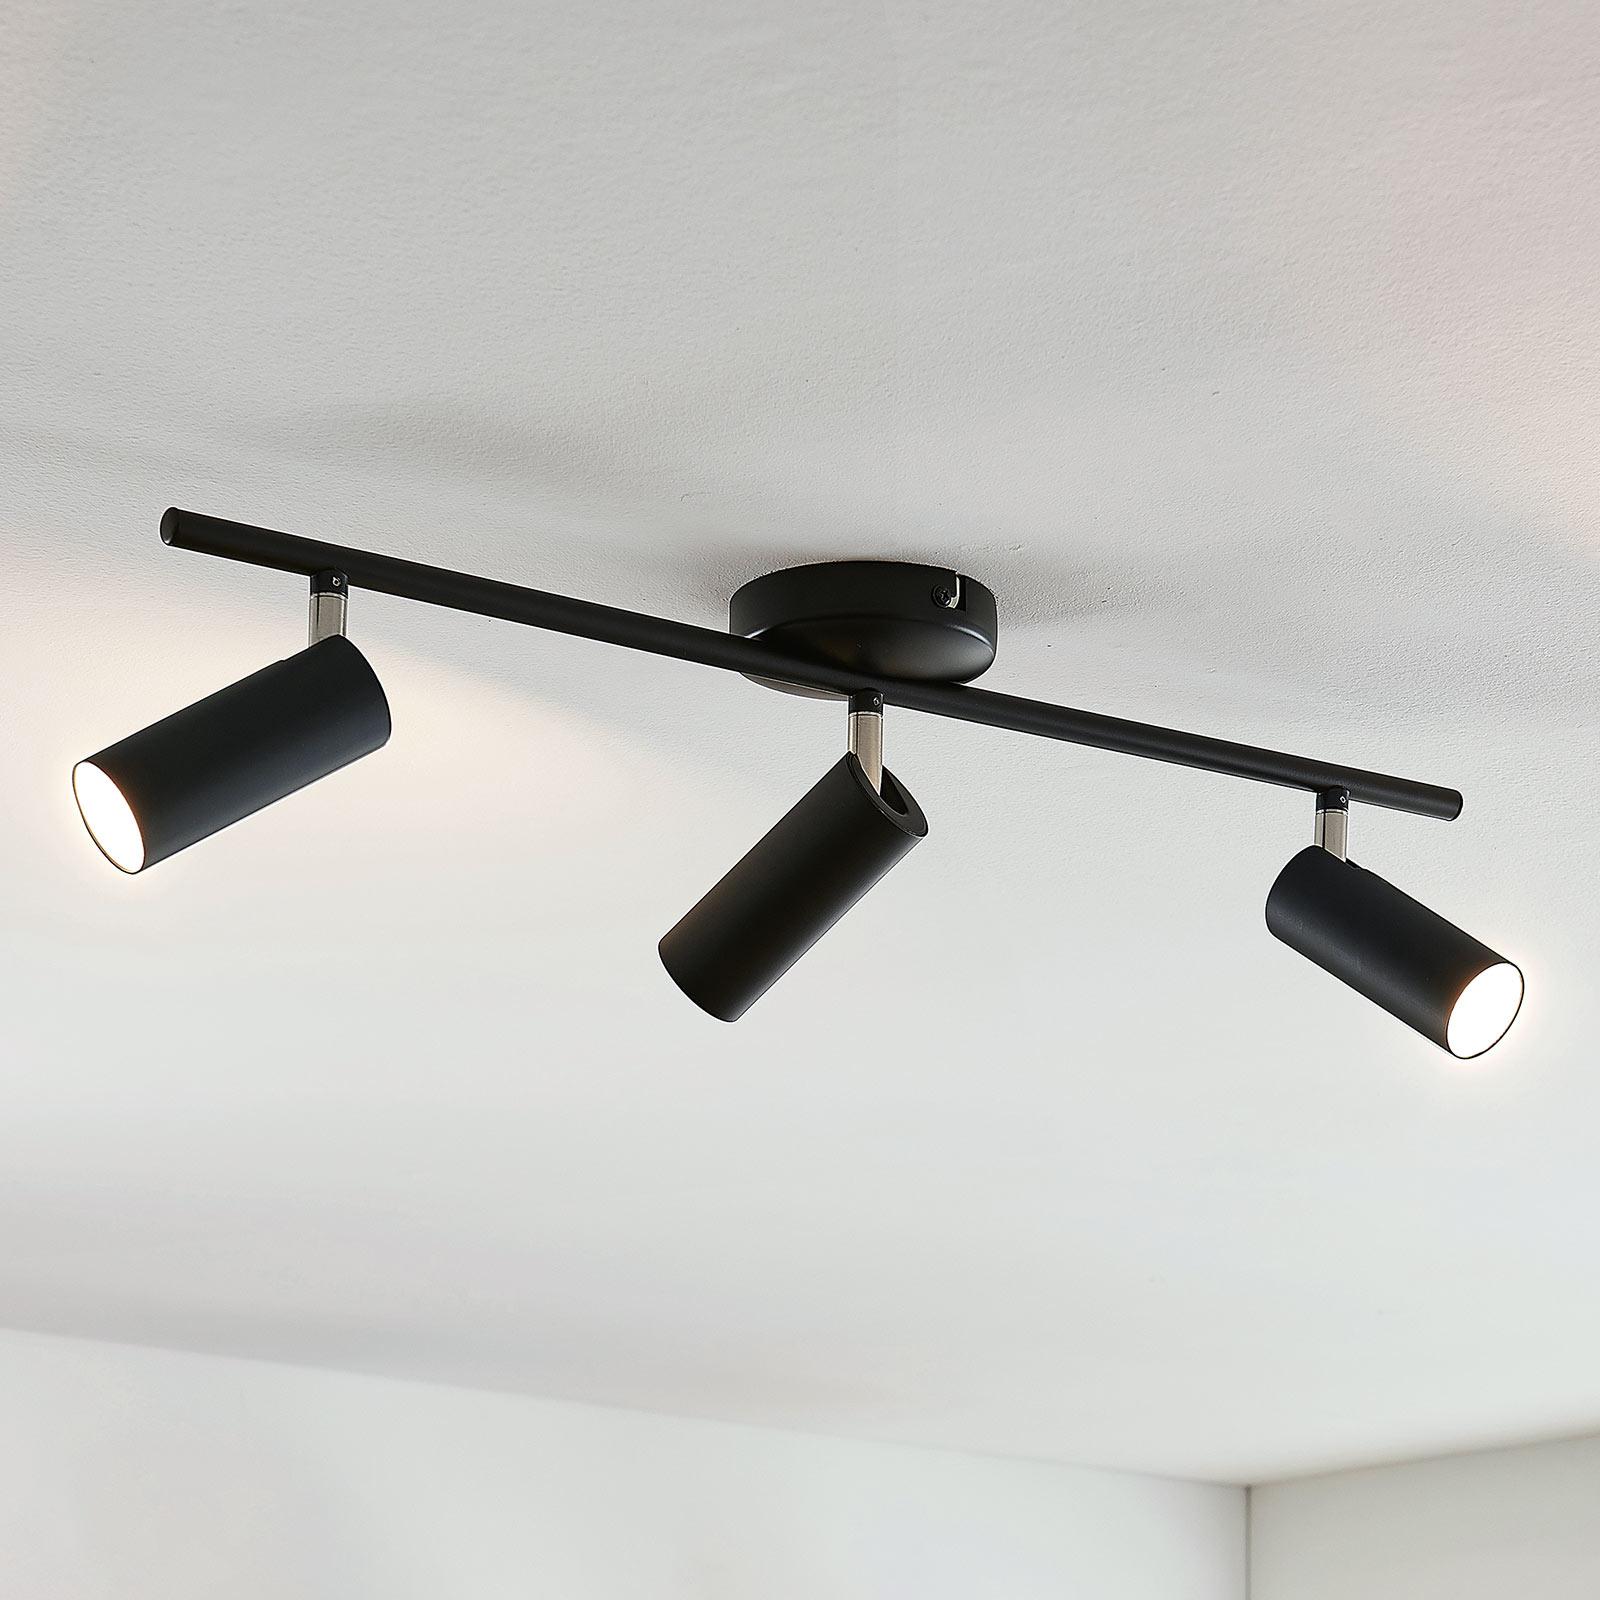 Lampa sufitowa LED Camille czarna, 3-punktowa